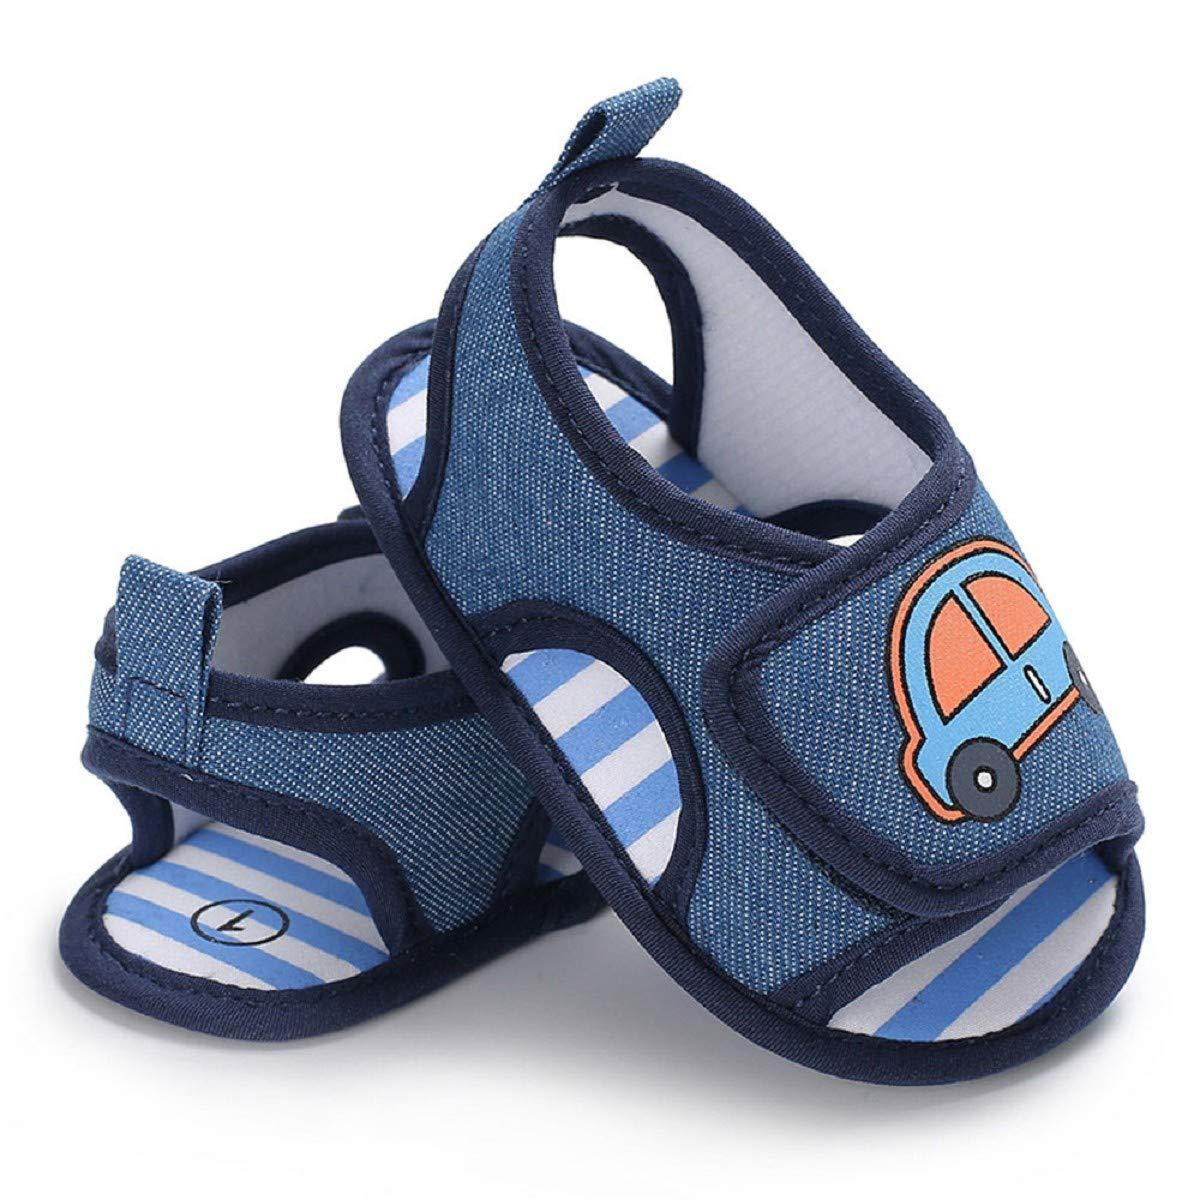 Infant Sandals FAPIZI Baby Boy Girl Car Print Soft Sole Crib Newborn Shoes Casual Lightweight Flats